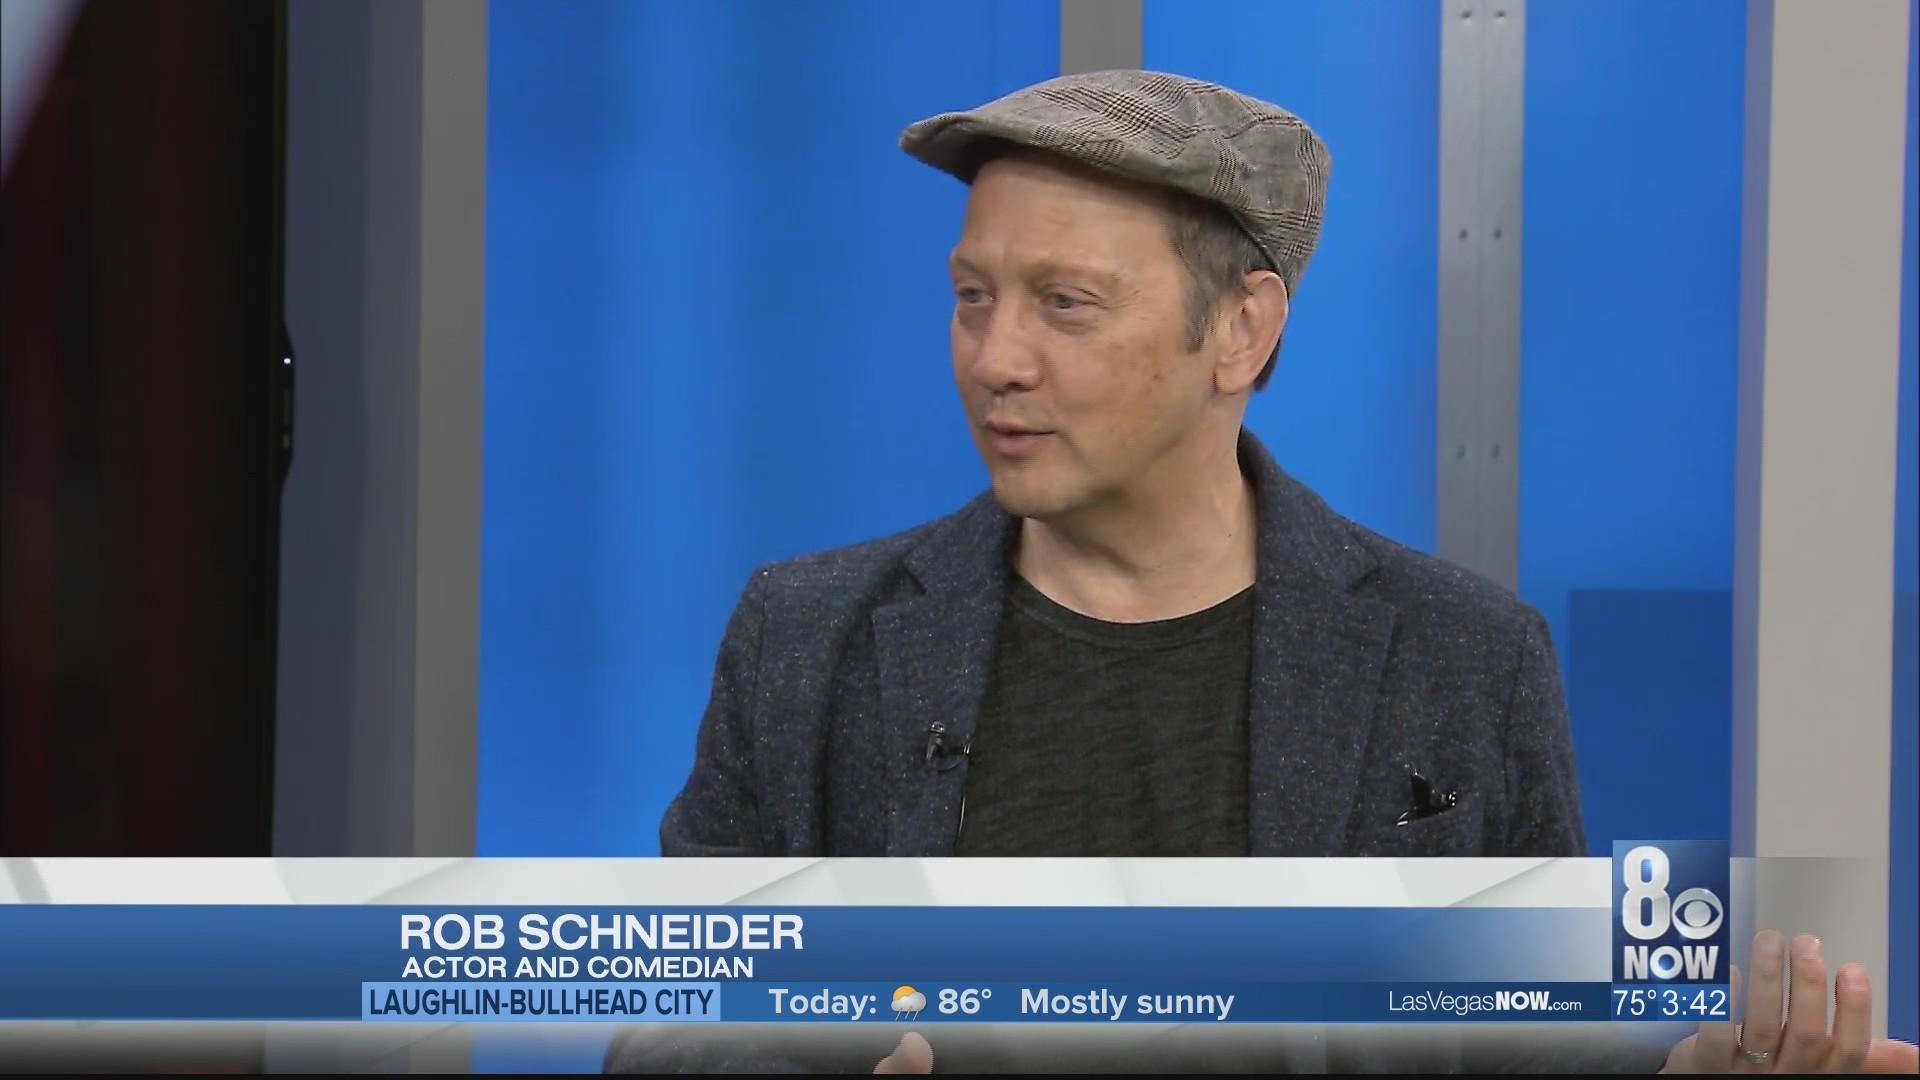 Rob Schneider visits Las Vegas Now